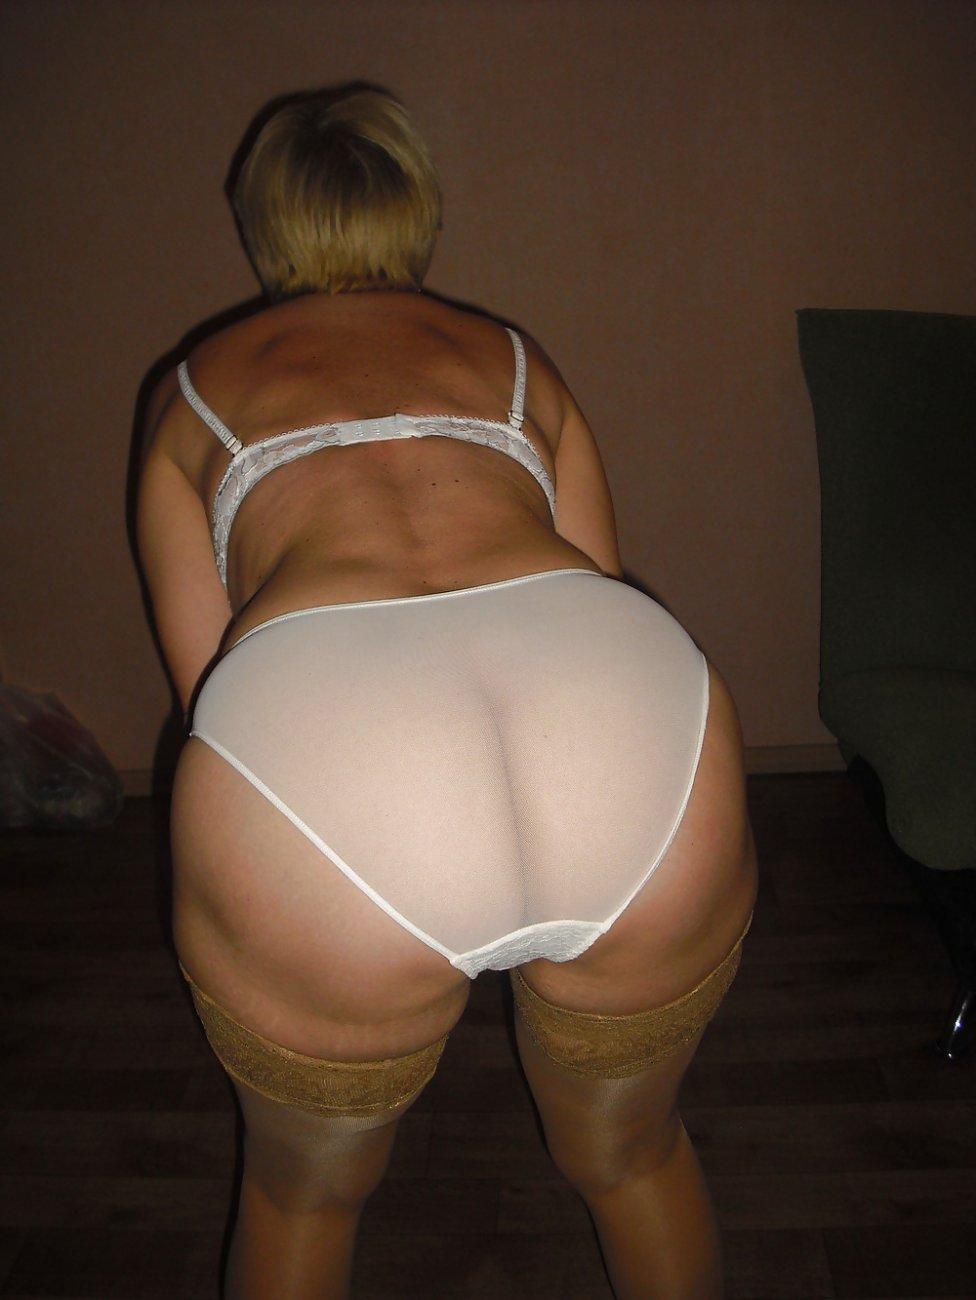 Фотогалерея задниц зрелых дам